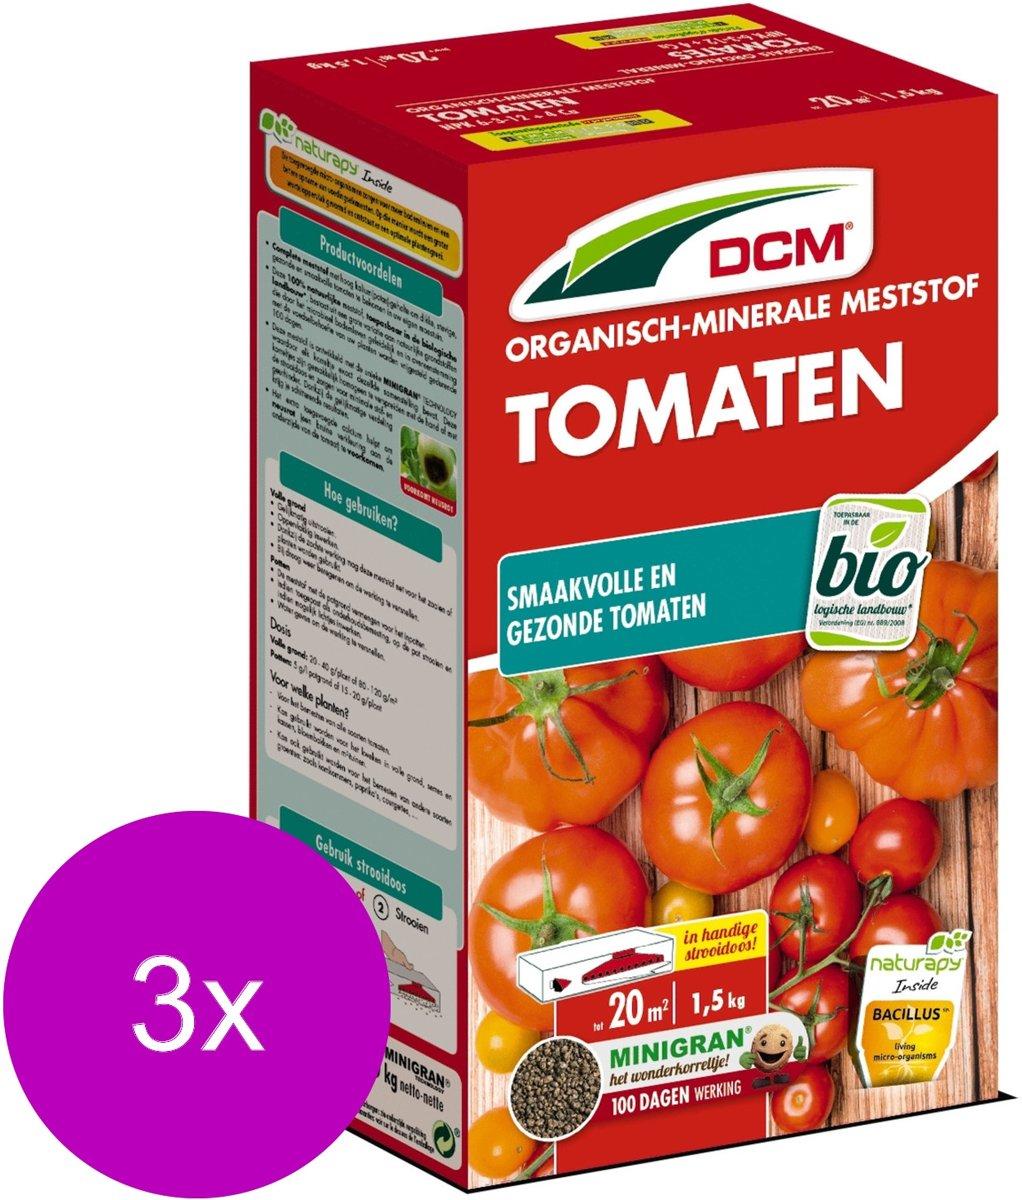 Dcm Meststof Tomaten - Moestuinmeststoffen - 3 x 20 m2 1.5 kg (Mg)